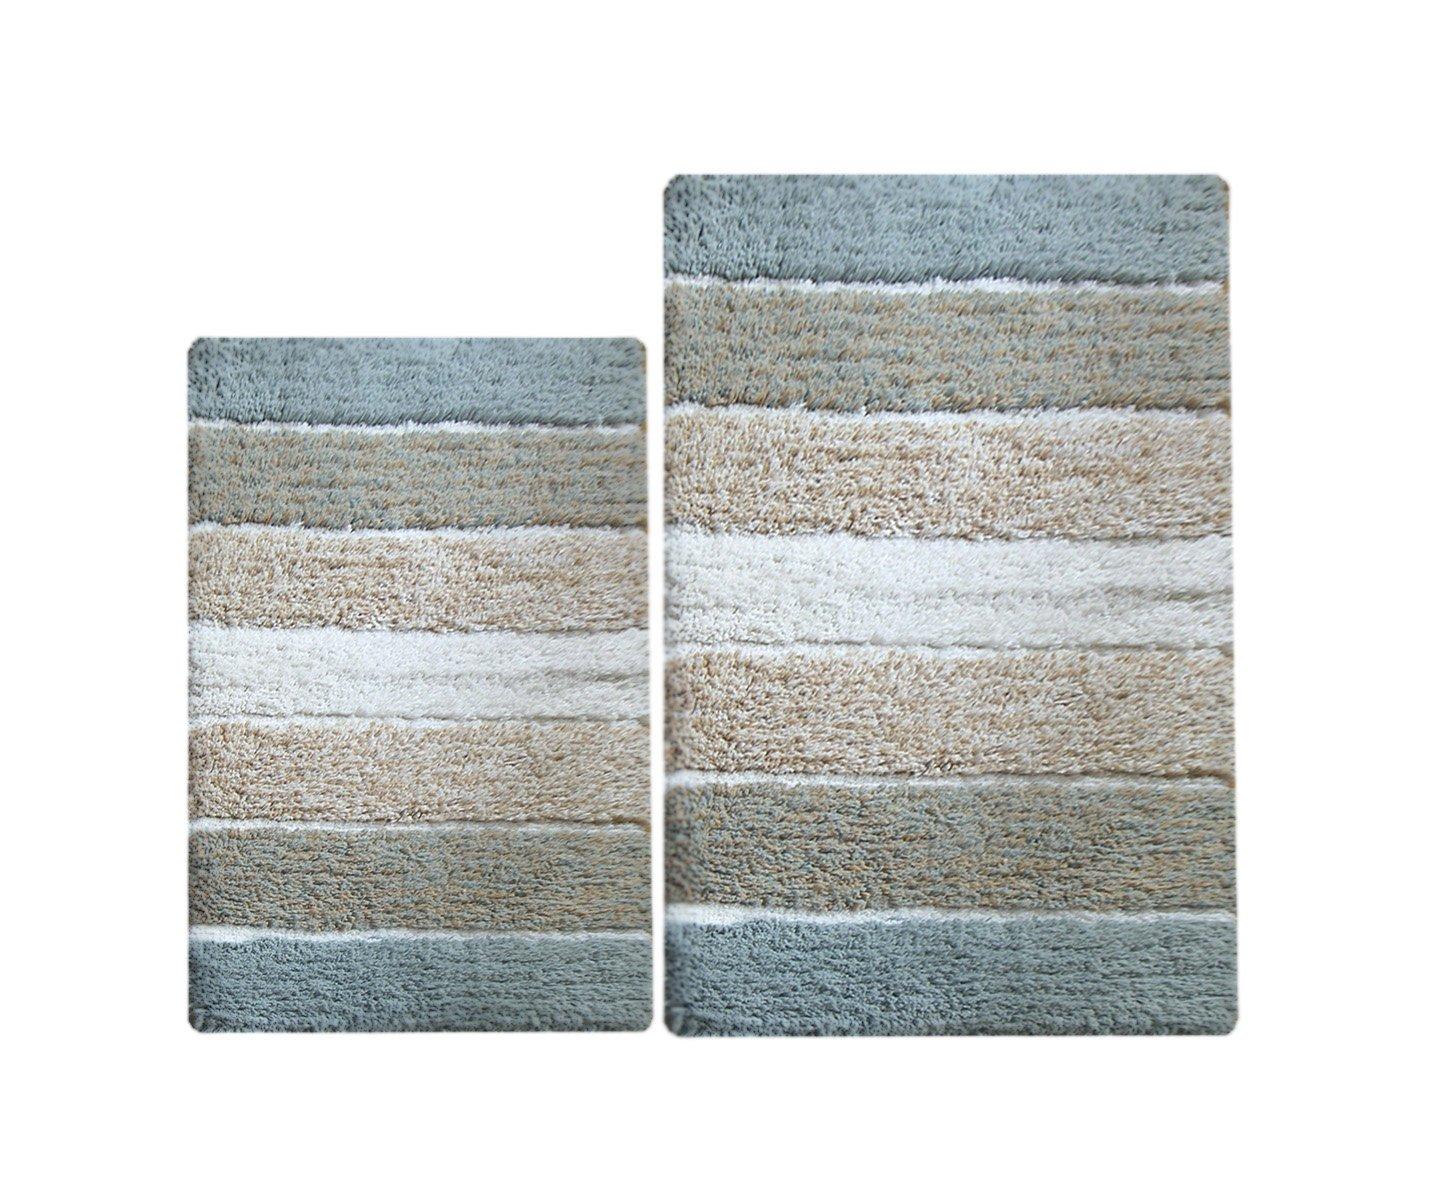 Chardin home 100% Pure Cotton - 2 Piece Cordural Stripe Bath Rug Set, (21''x34'' & 17''x24'') Gray-Beige with Latex spray non-skid backing